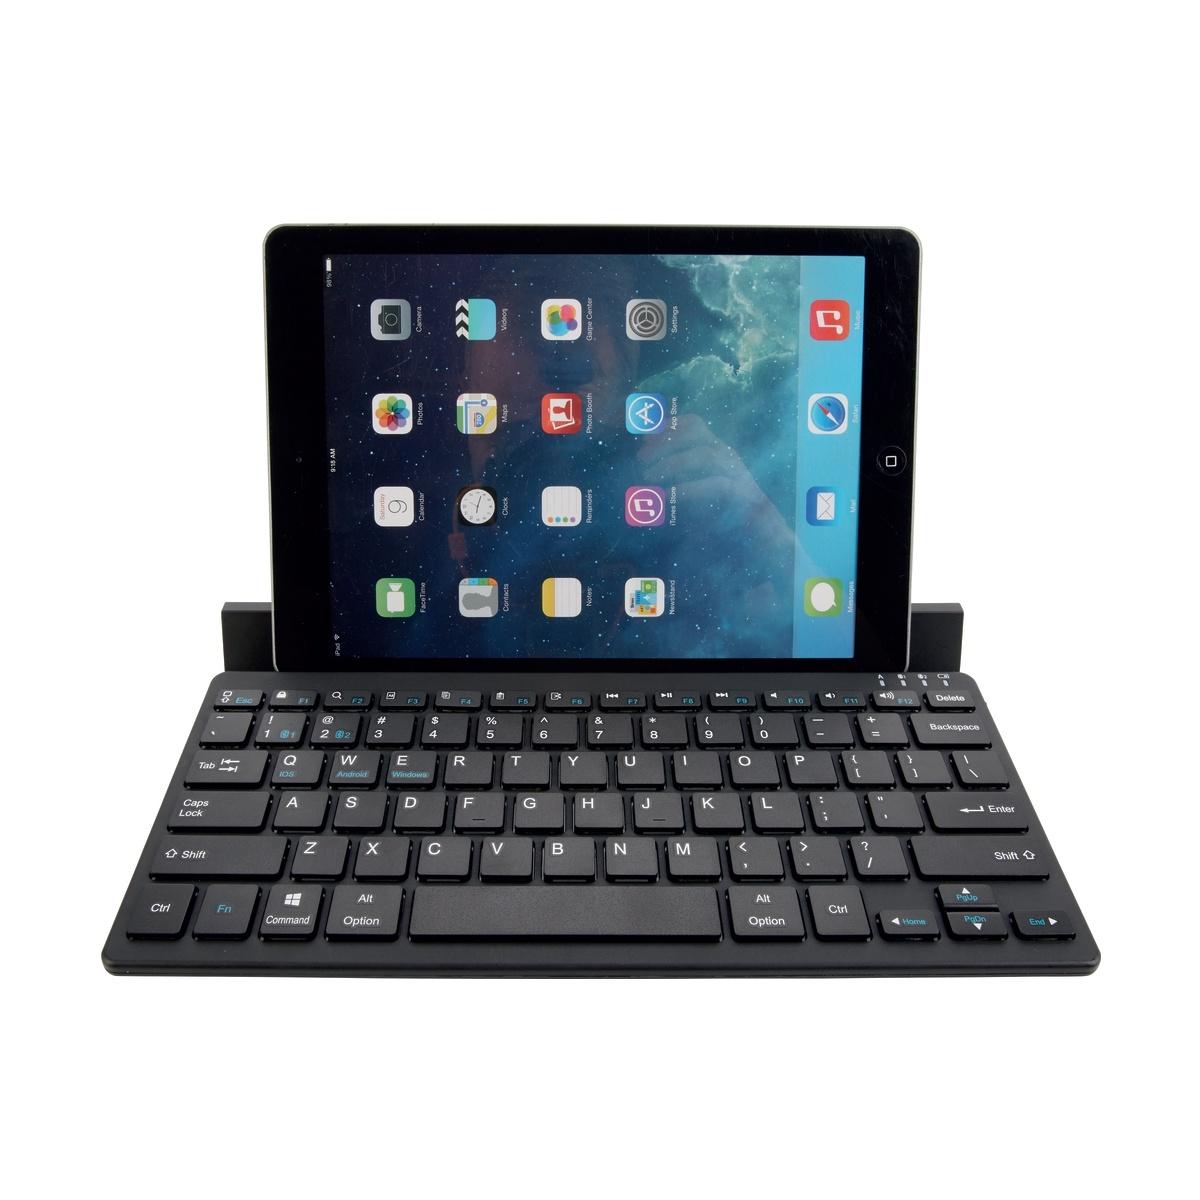 Bluetooth Rechargeable Keyboard | Kmart